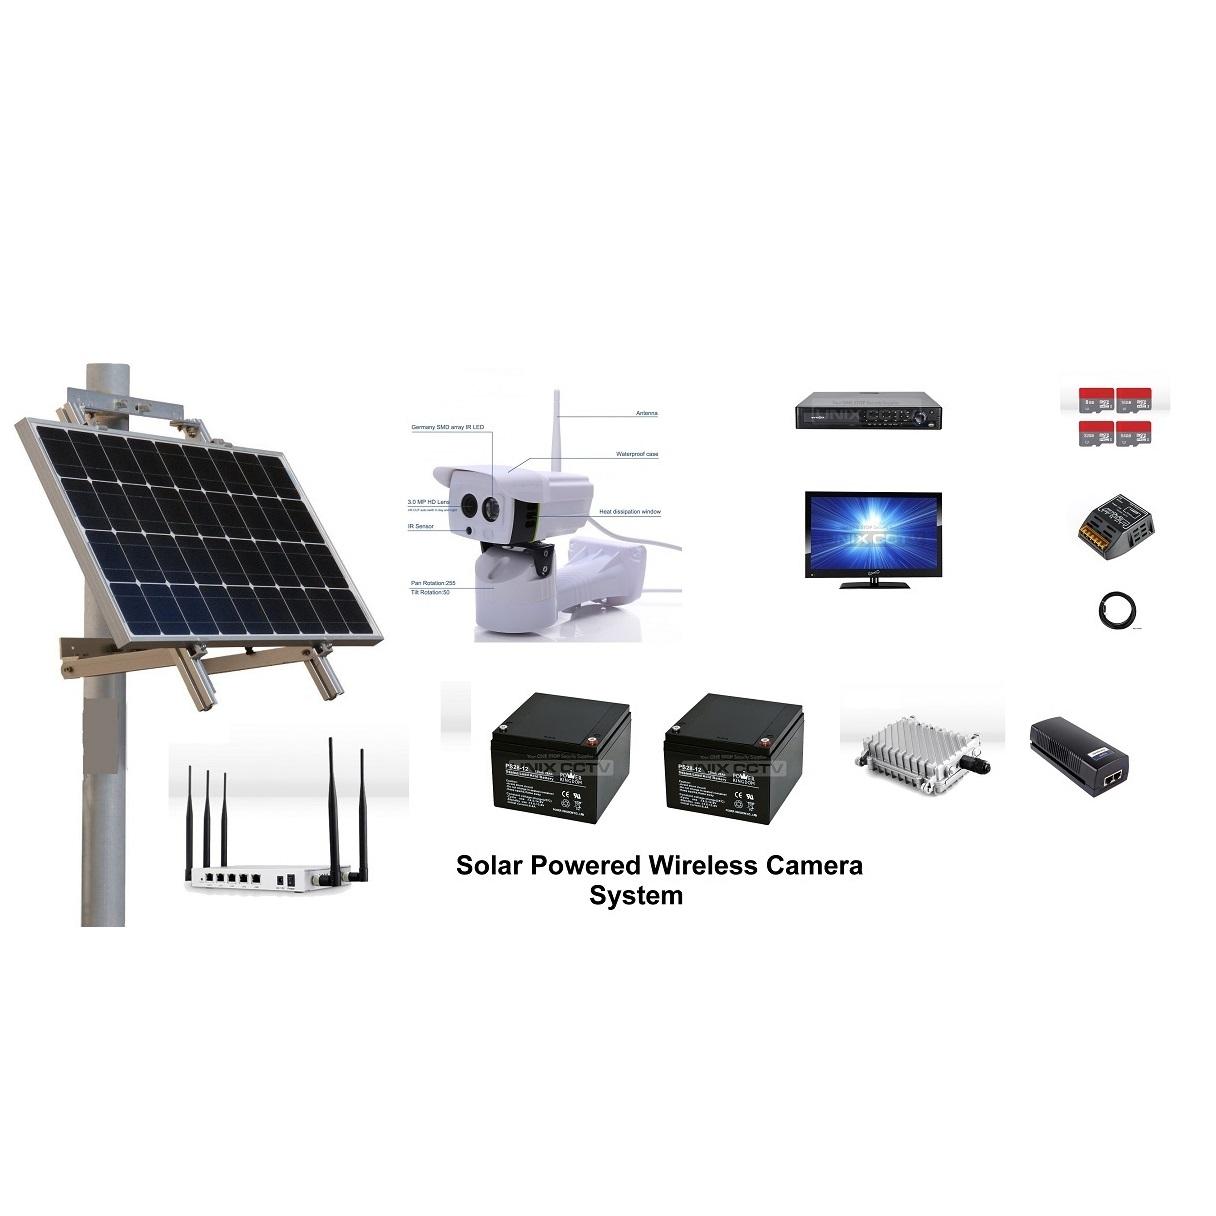 http://www.babineausystems.com/wp-content/uploads/2017/11/Solar-Camera-6b.jpg